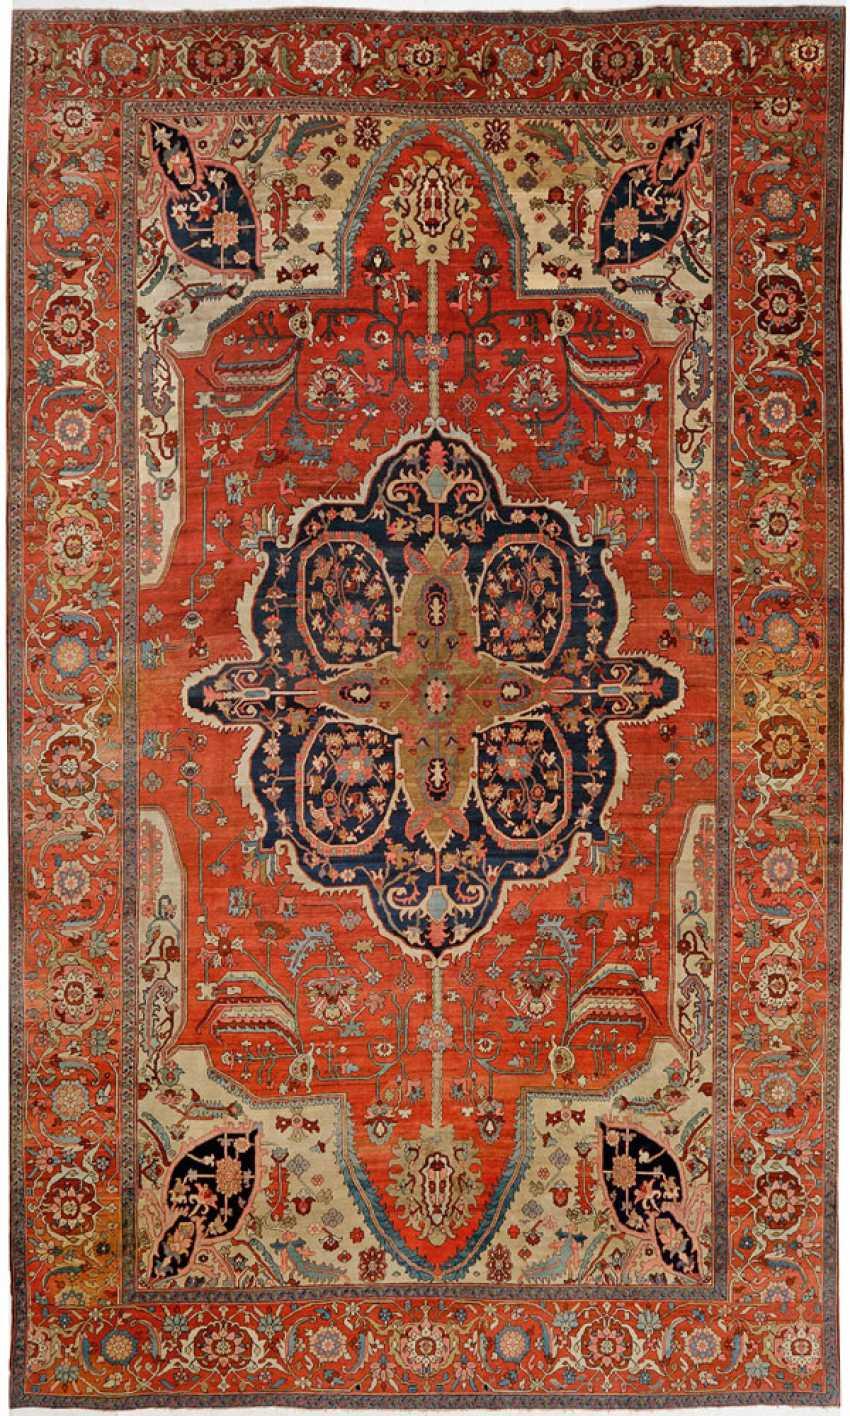 Very rare antique oversize Heriz carpet - photo 1